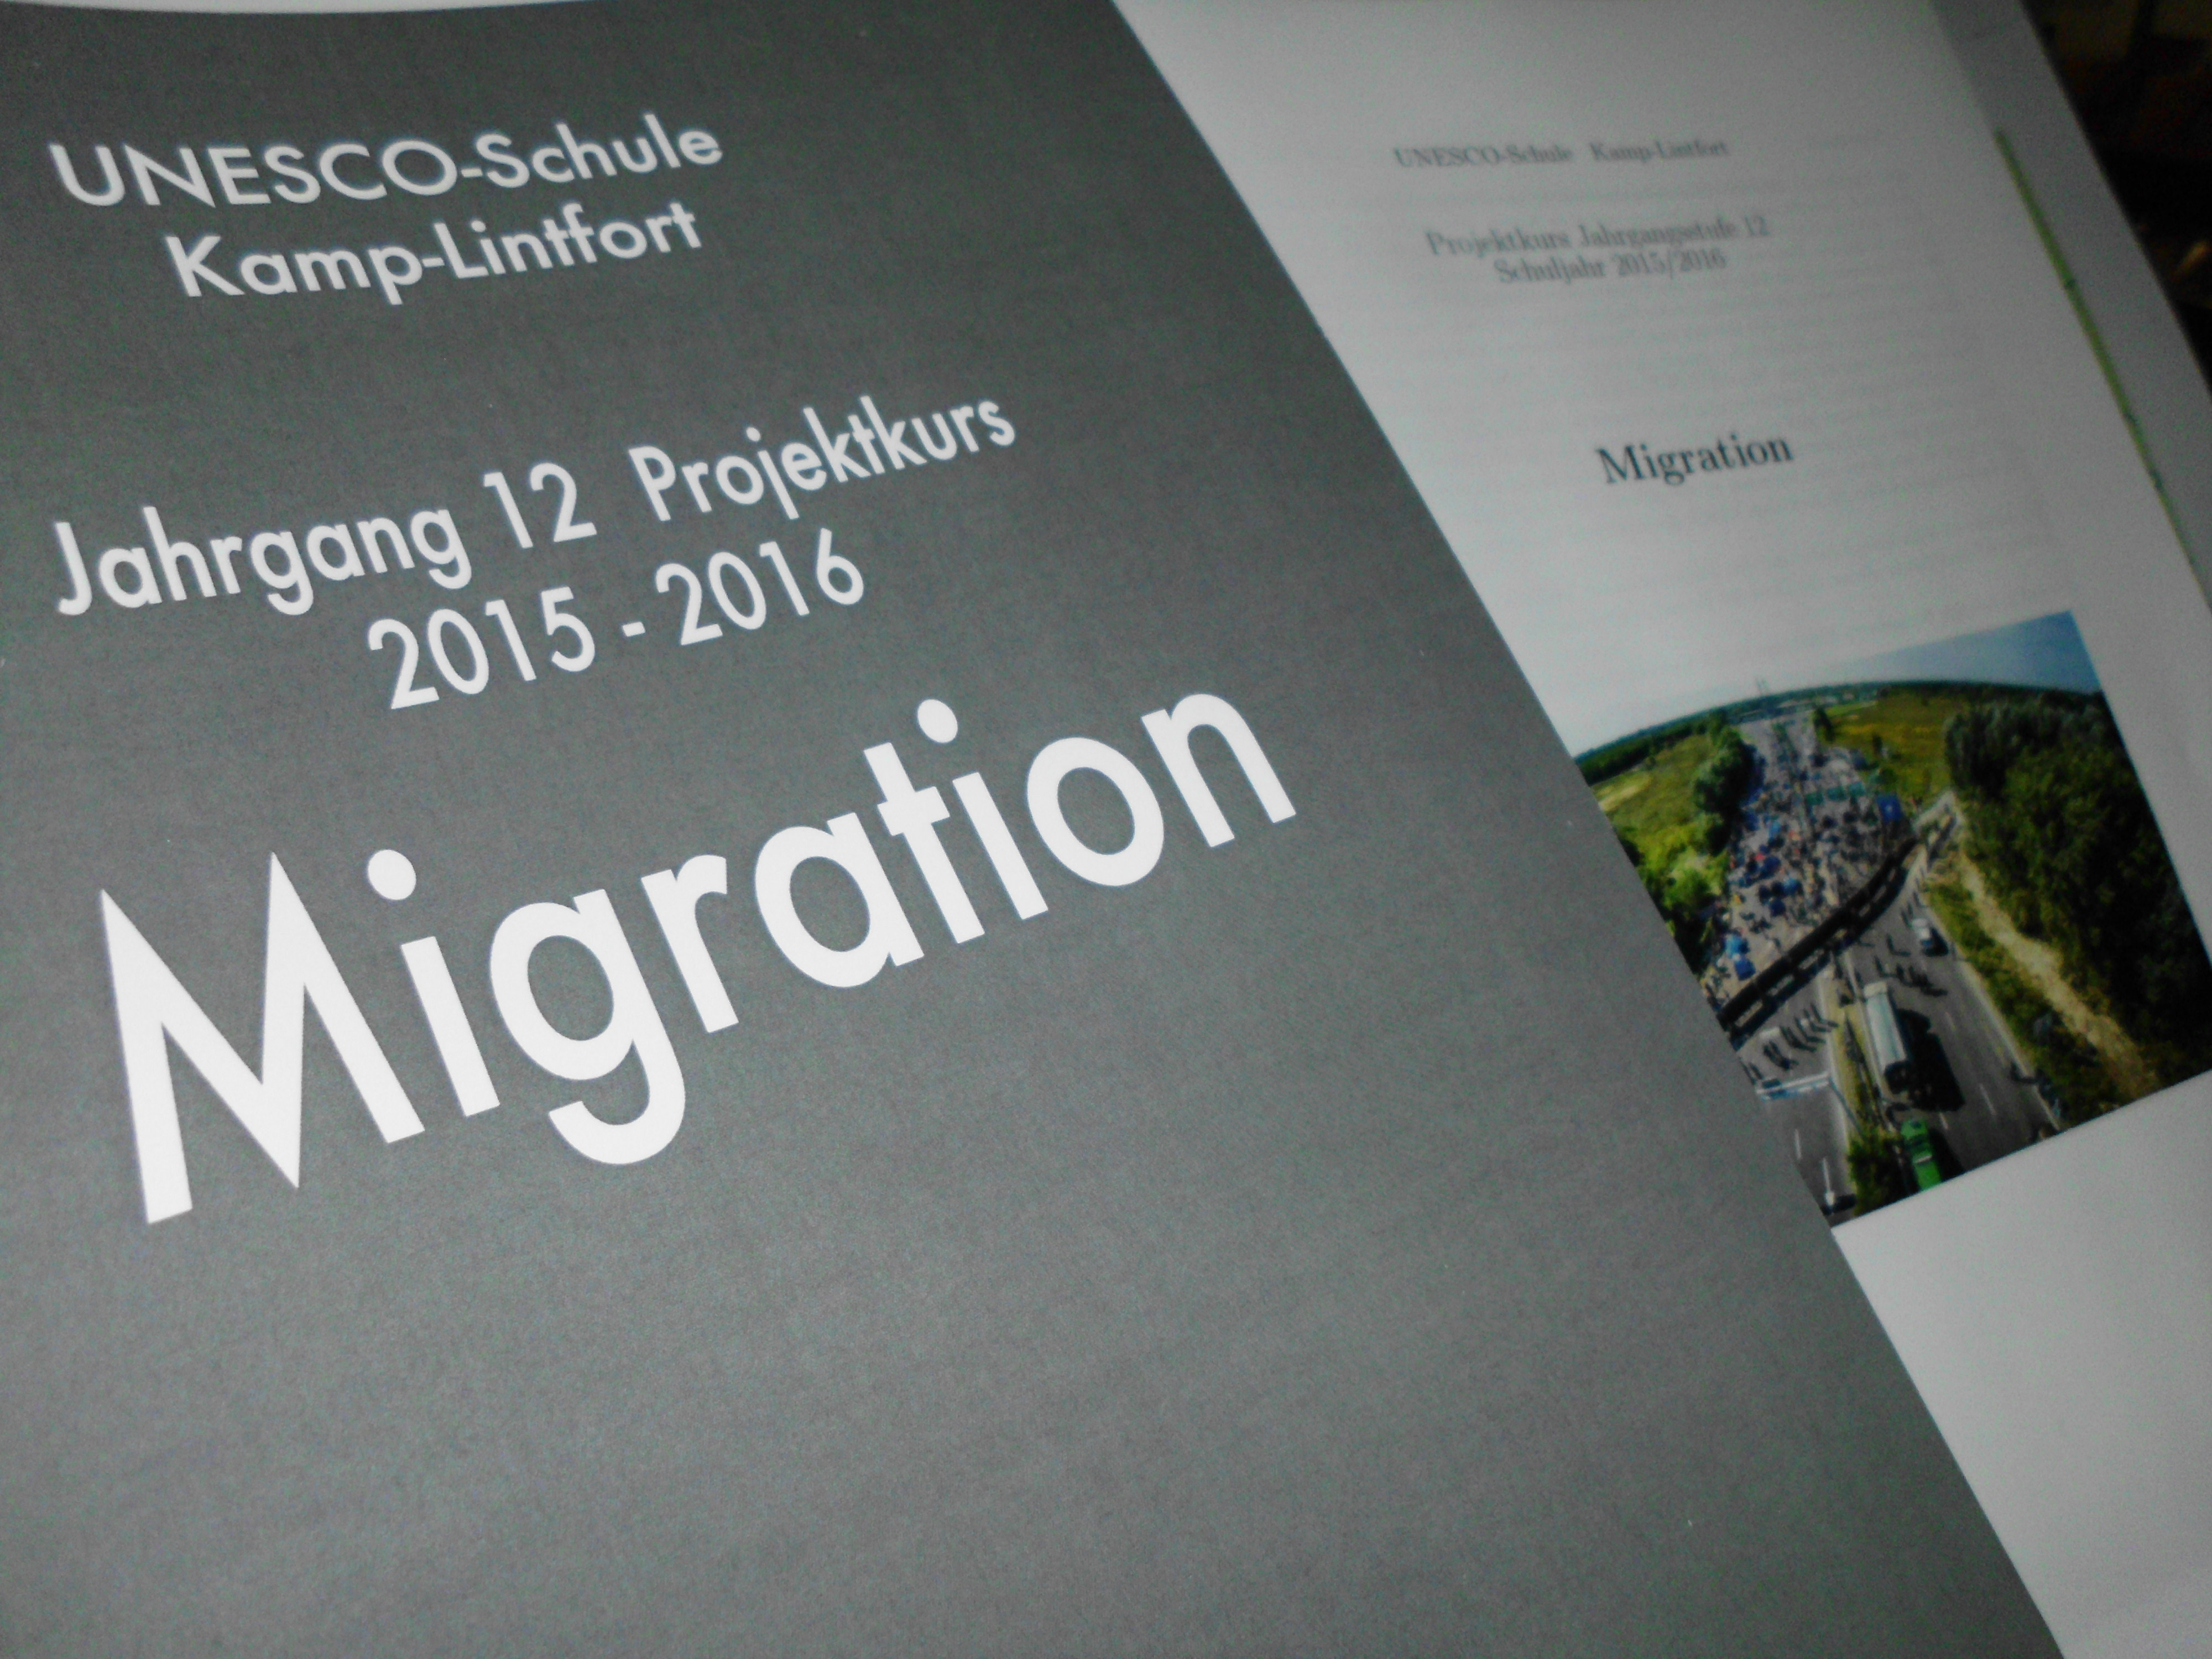 MigrationDokuUNESCOsSchule